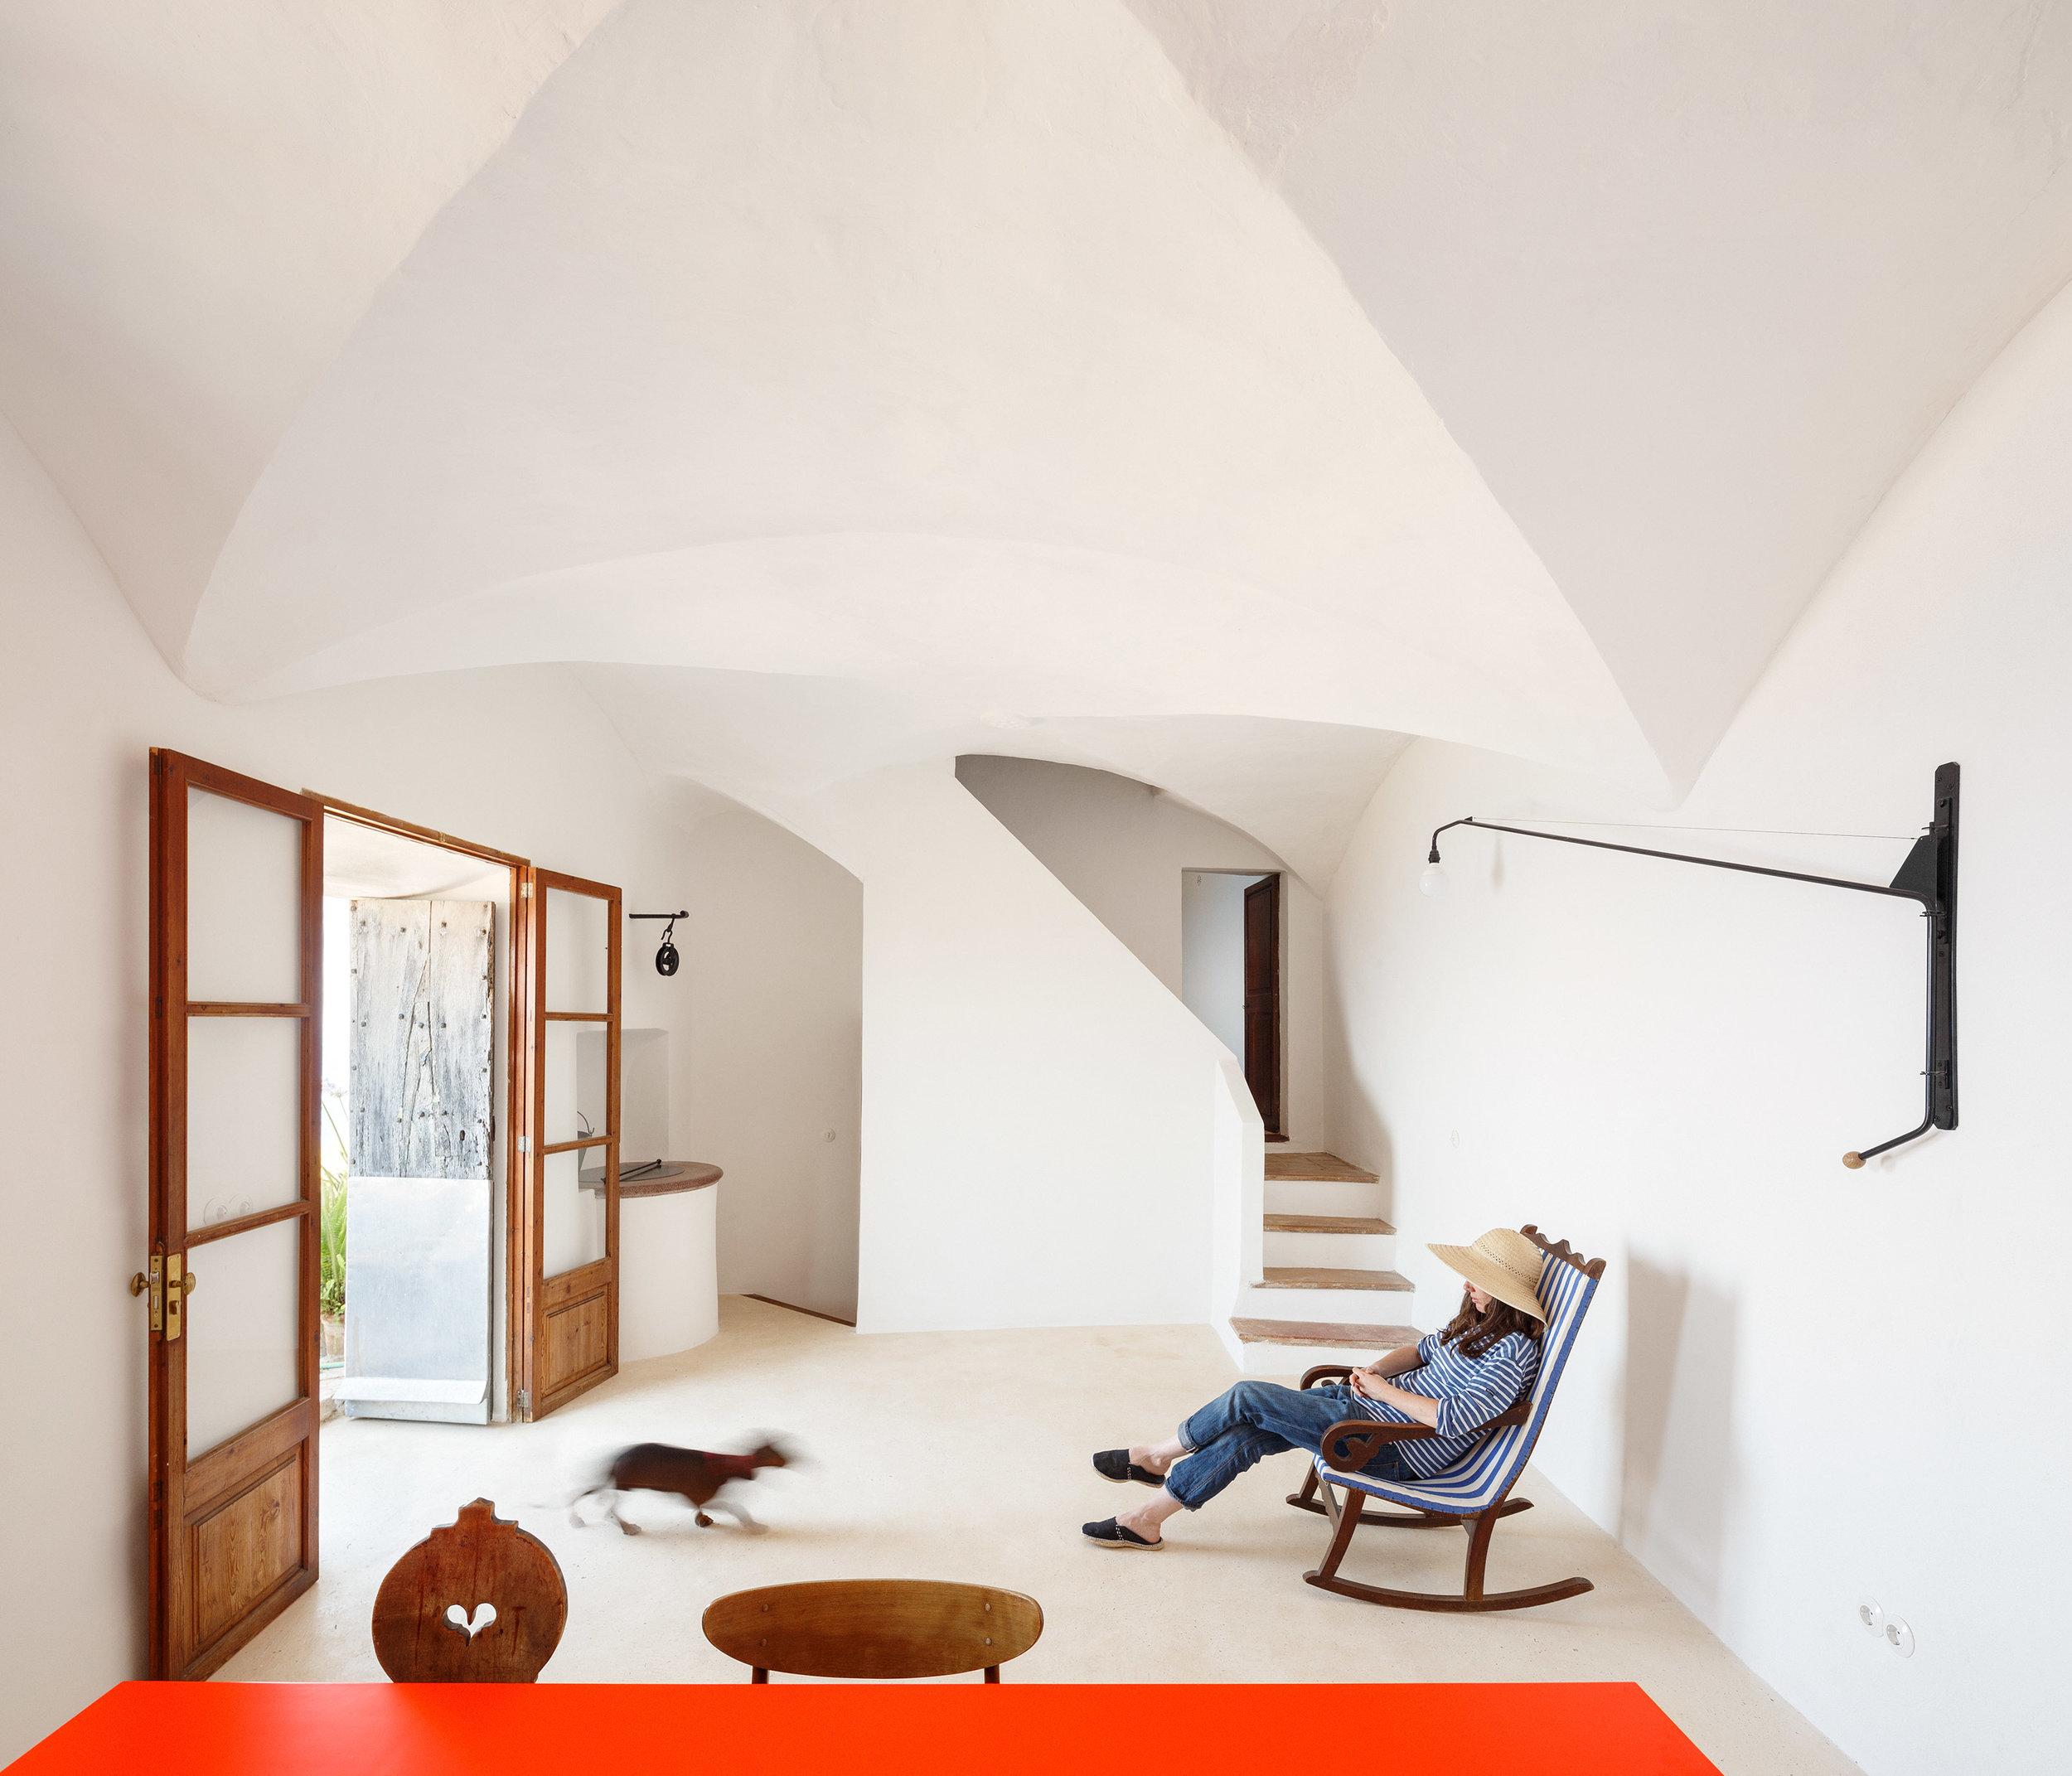 Ca'n Rei Banyalbufar, Mallorca House renovation